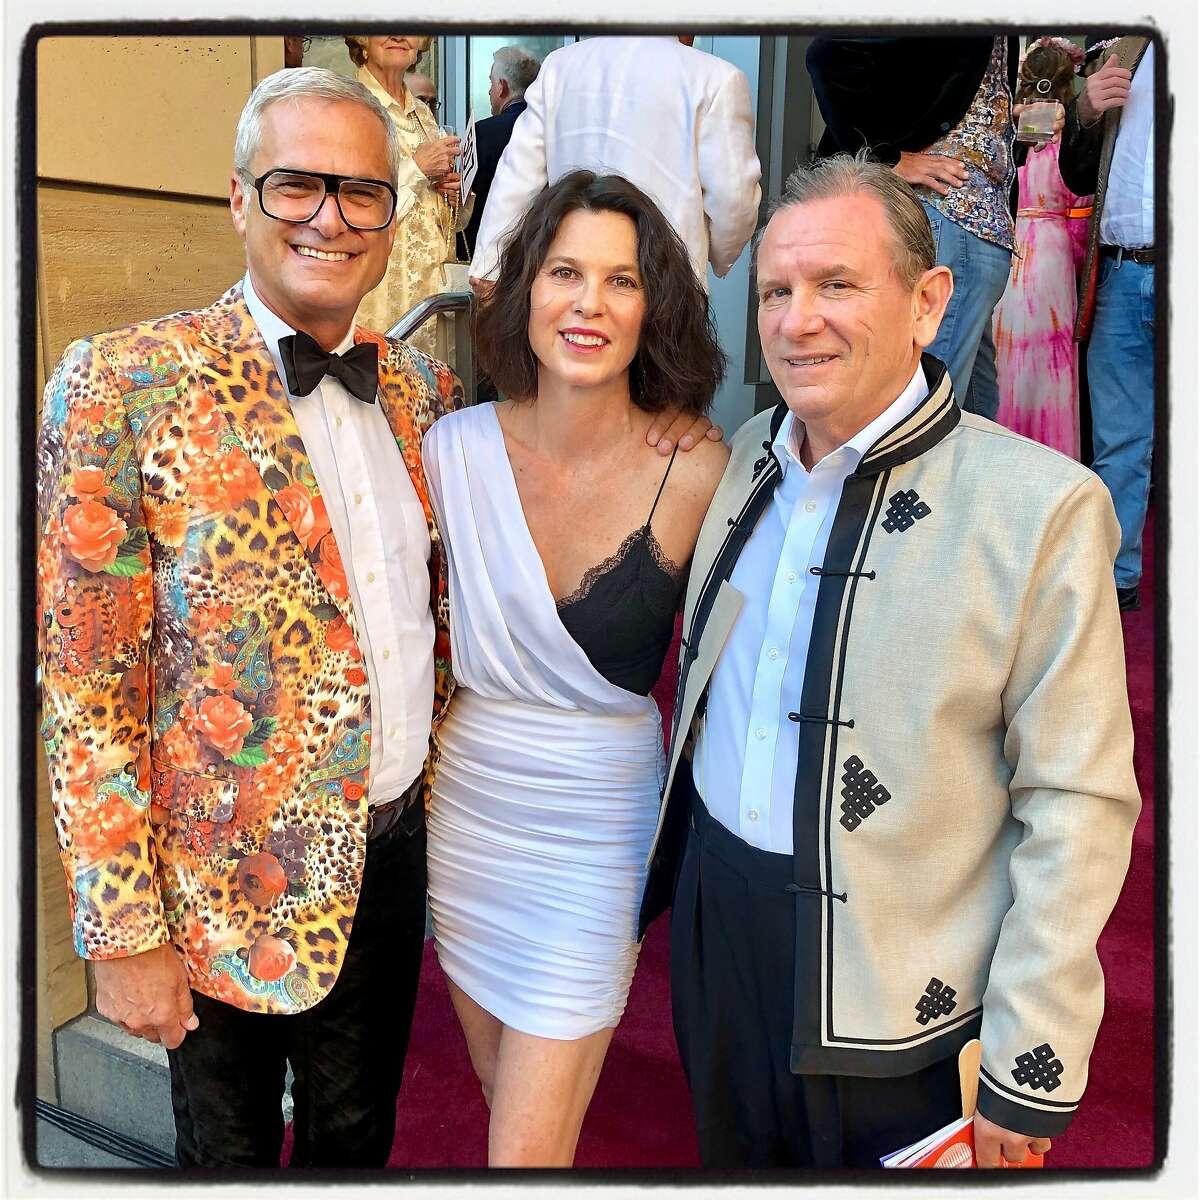 San Jose Museum of Art gala-goers (from left) Mark Ritchie, SF Arts Commission chairman Dorka Keehn and Joe Tobin. Sept. 21, 2019.